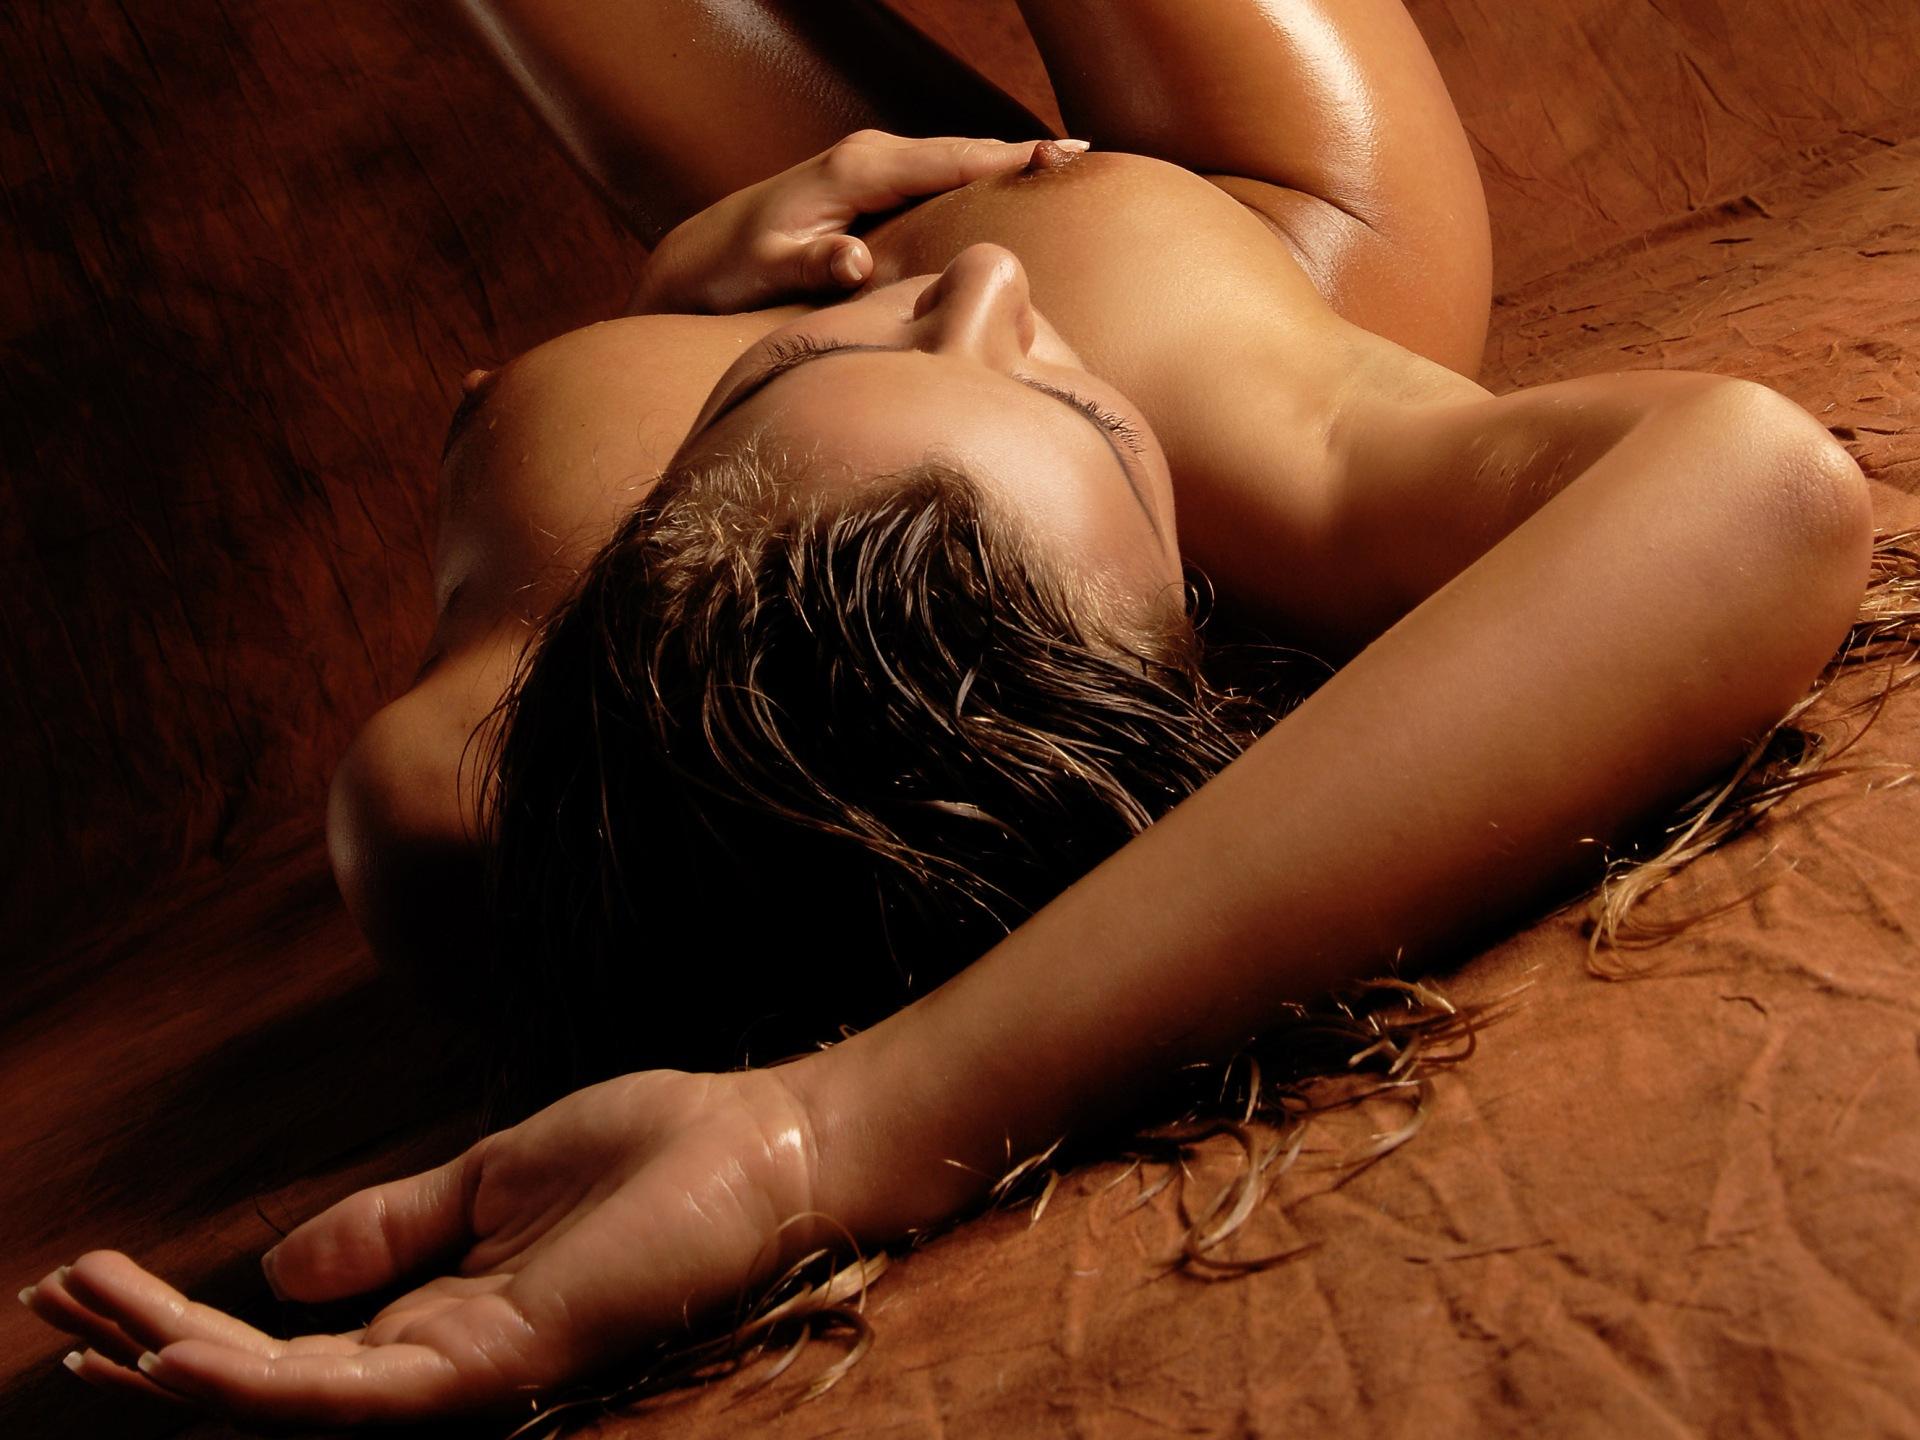 Интимные картинки девушек